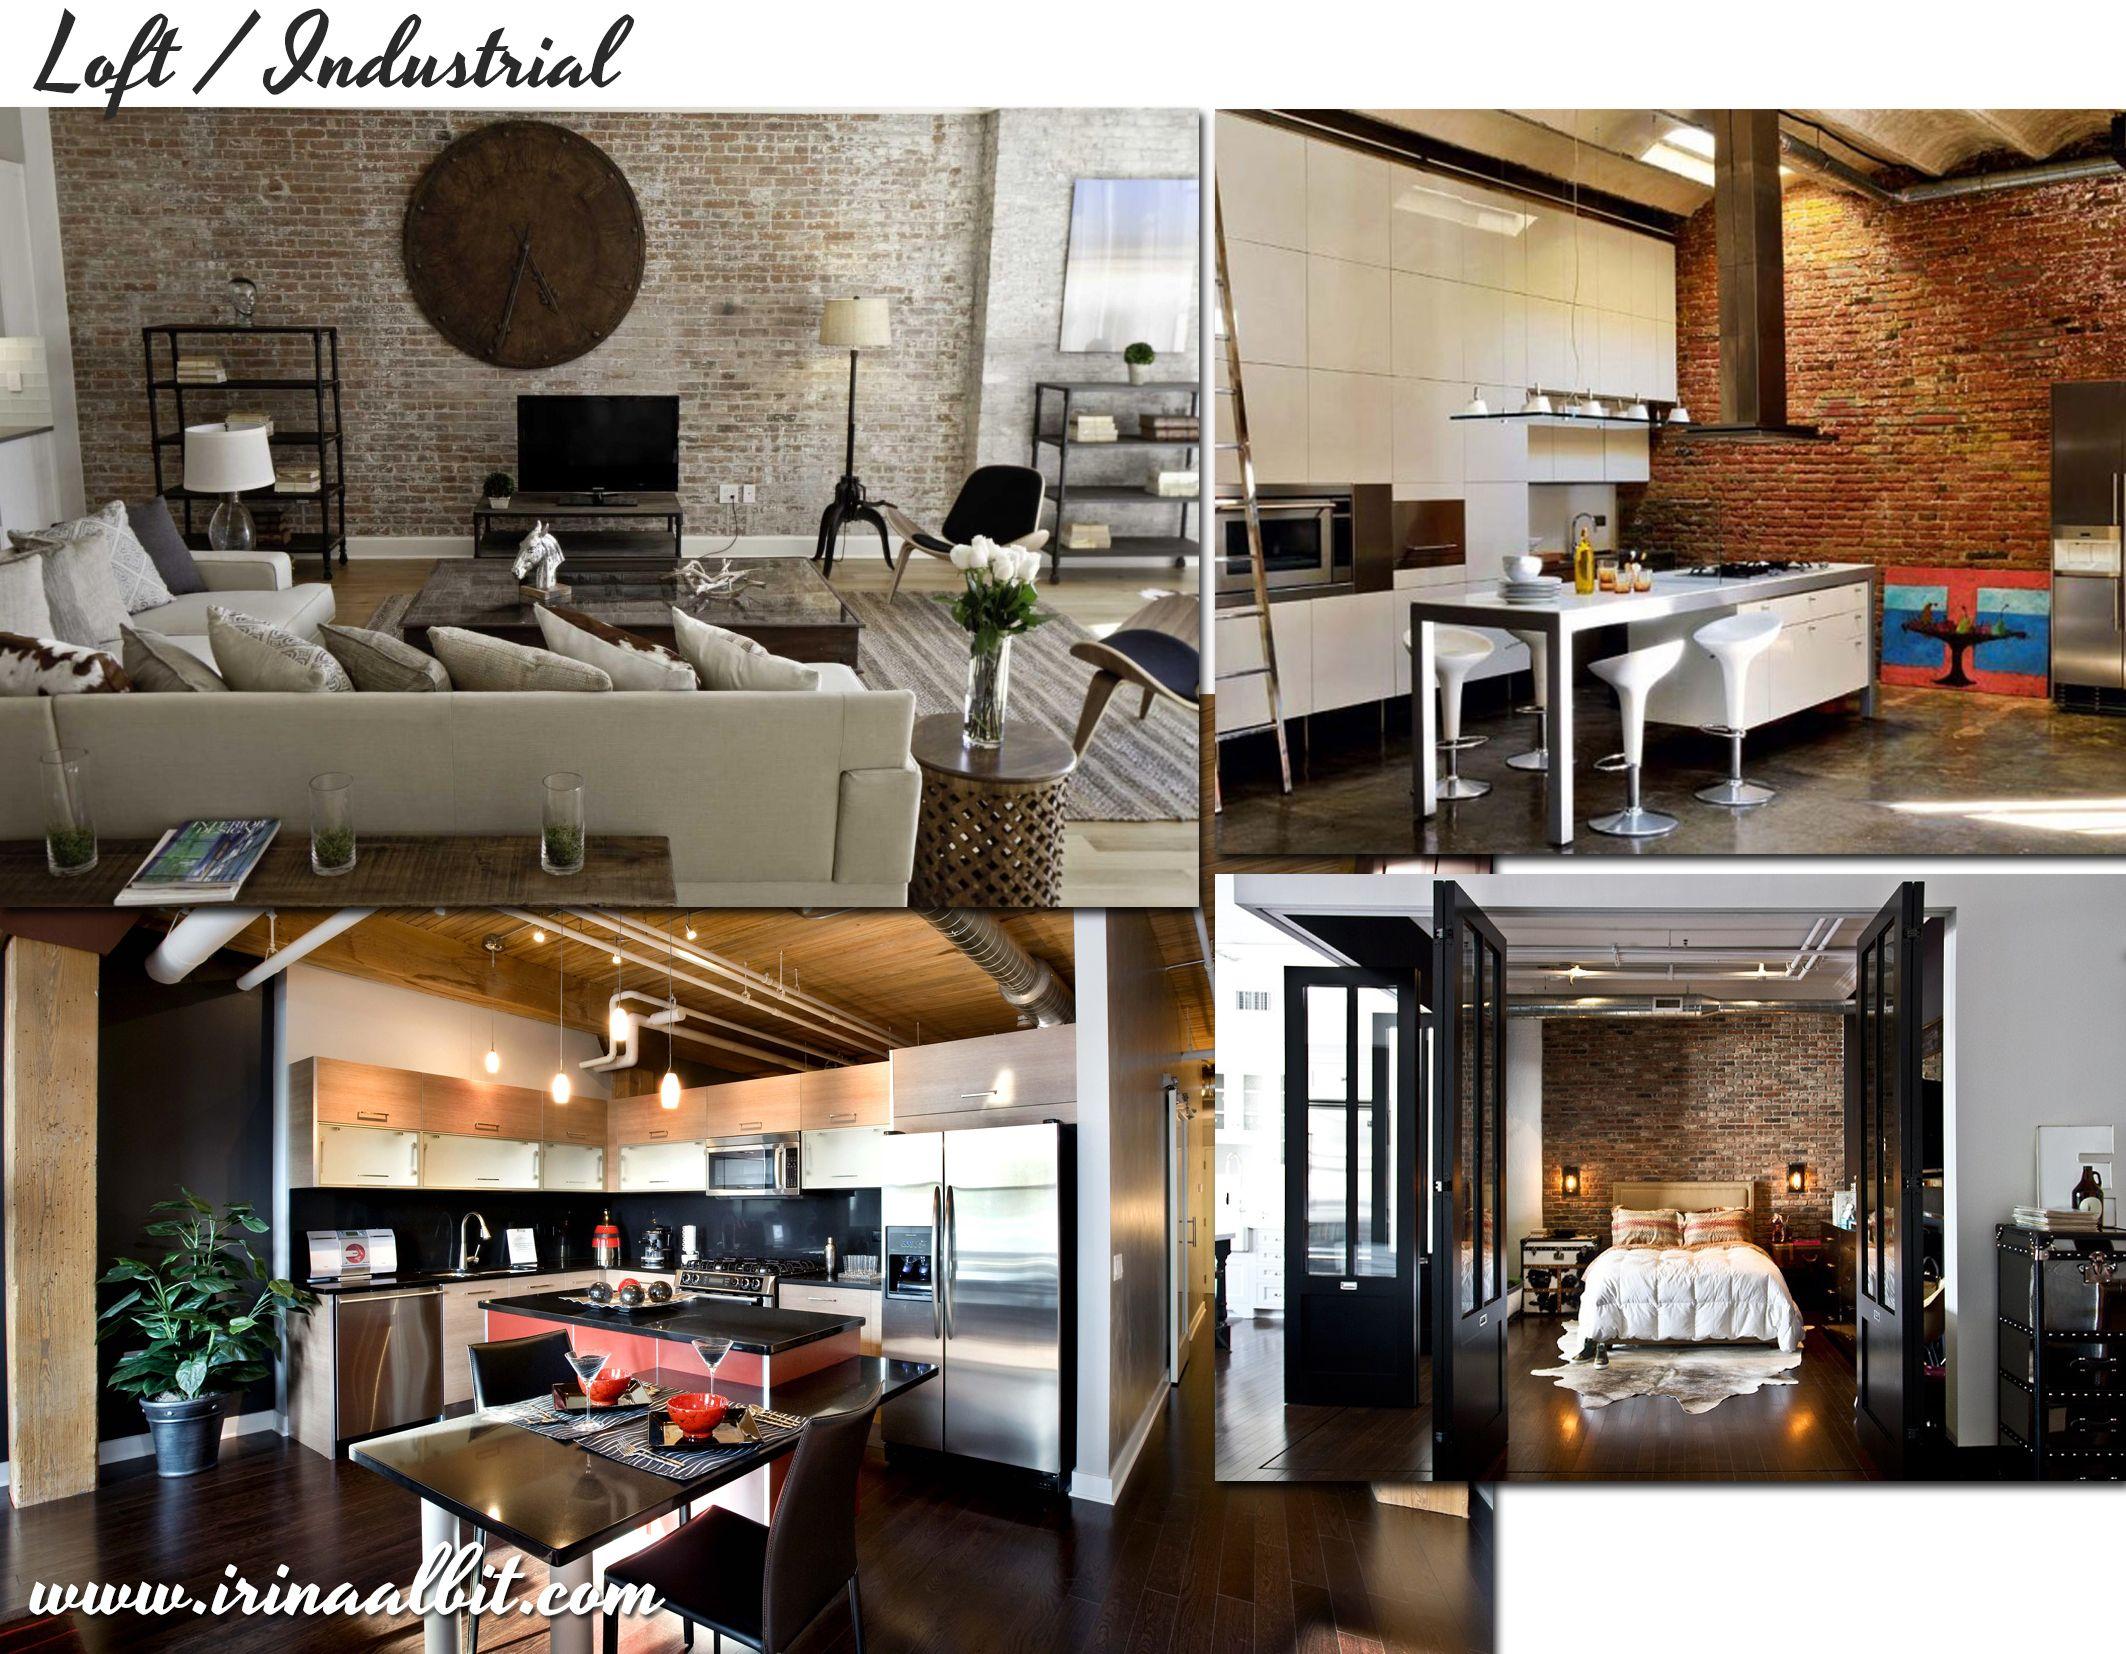 arredamento country, vintage, industrial, loft, urban, shabby chic, Innenarchitektur ideen